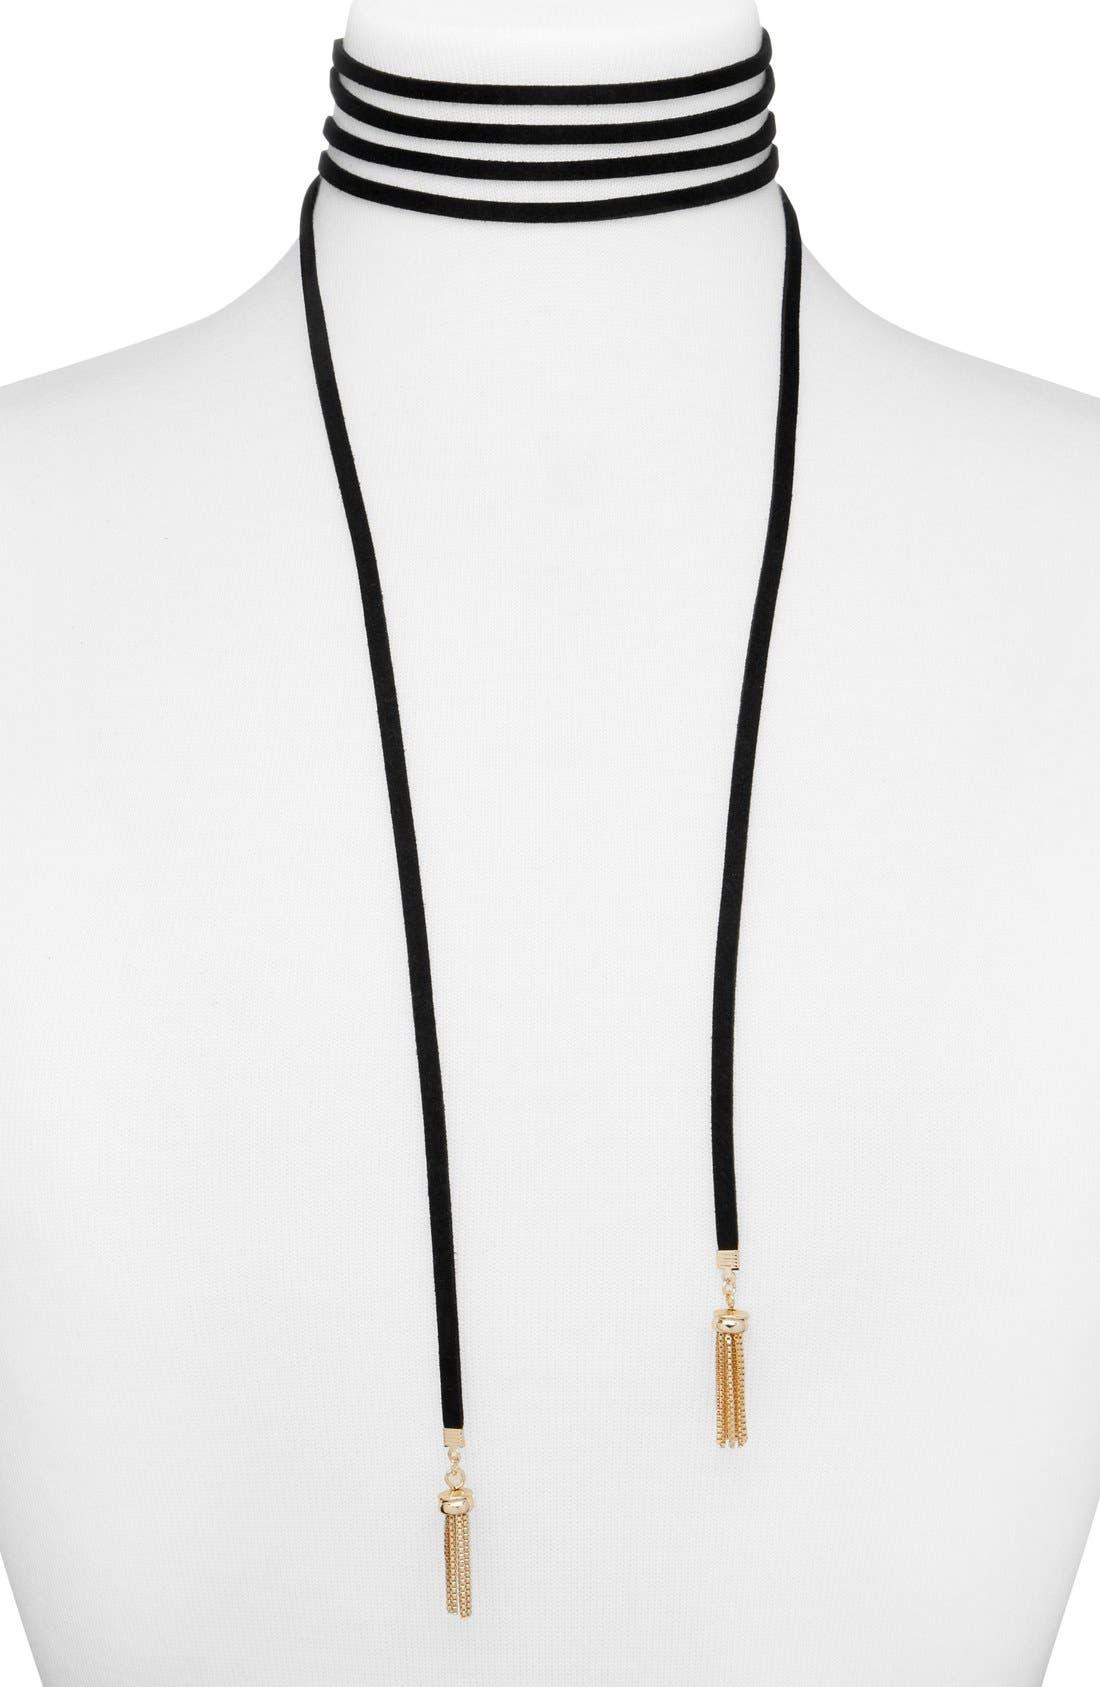 Alternate Image 1 Selected - BaubleBar Lariat Choker Necklace